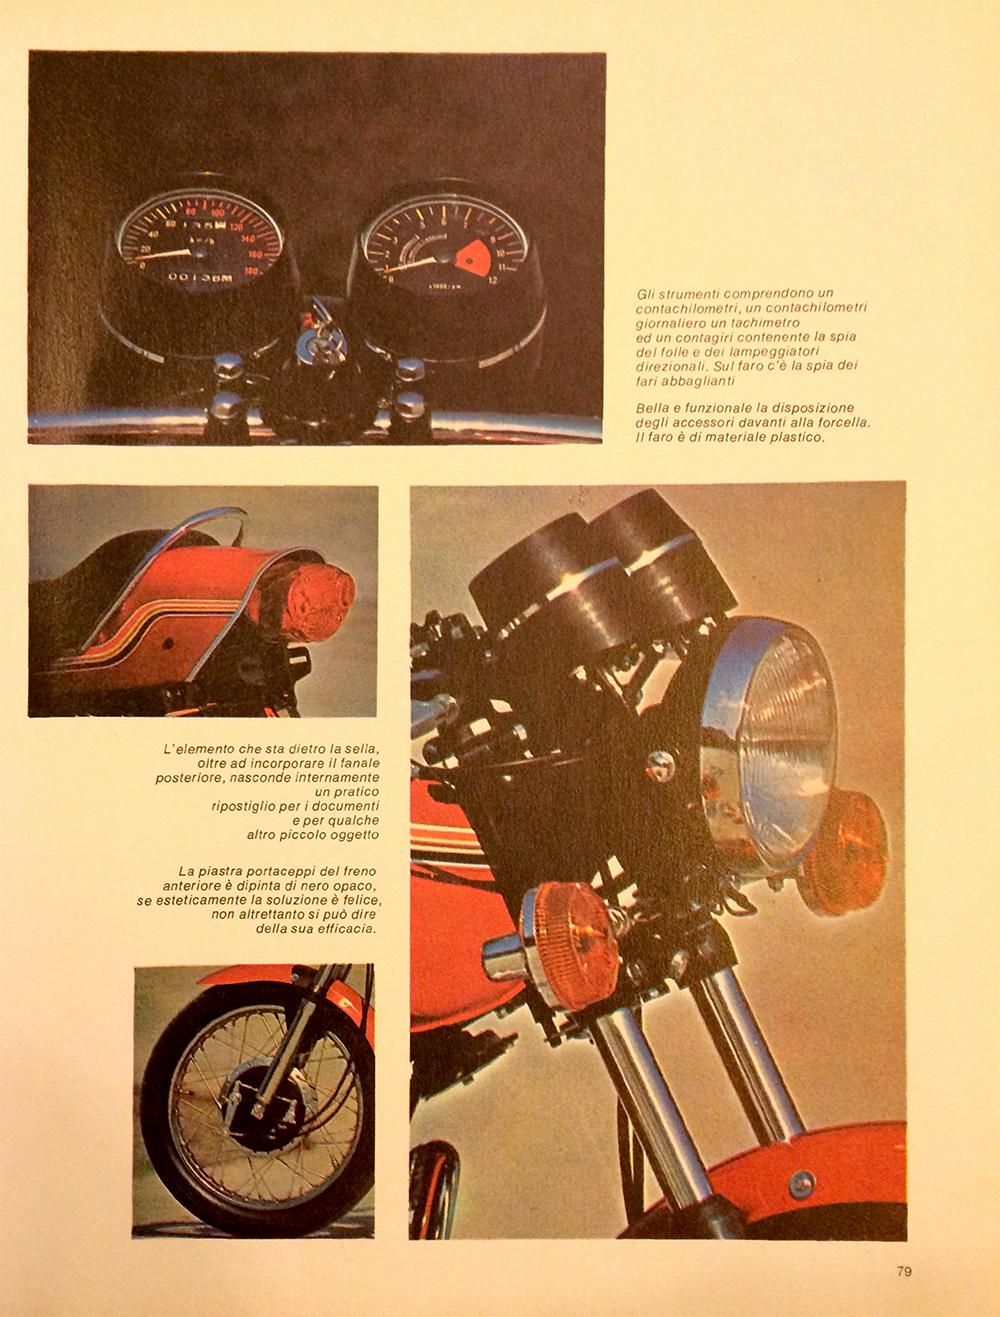 1971 Kawasaki 350 S2 Italy road test 07.jpg